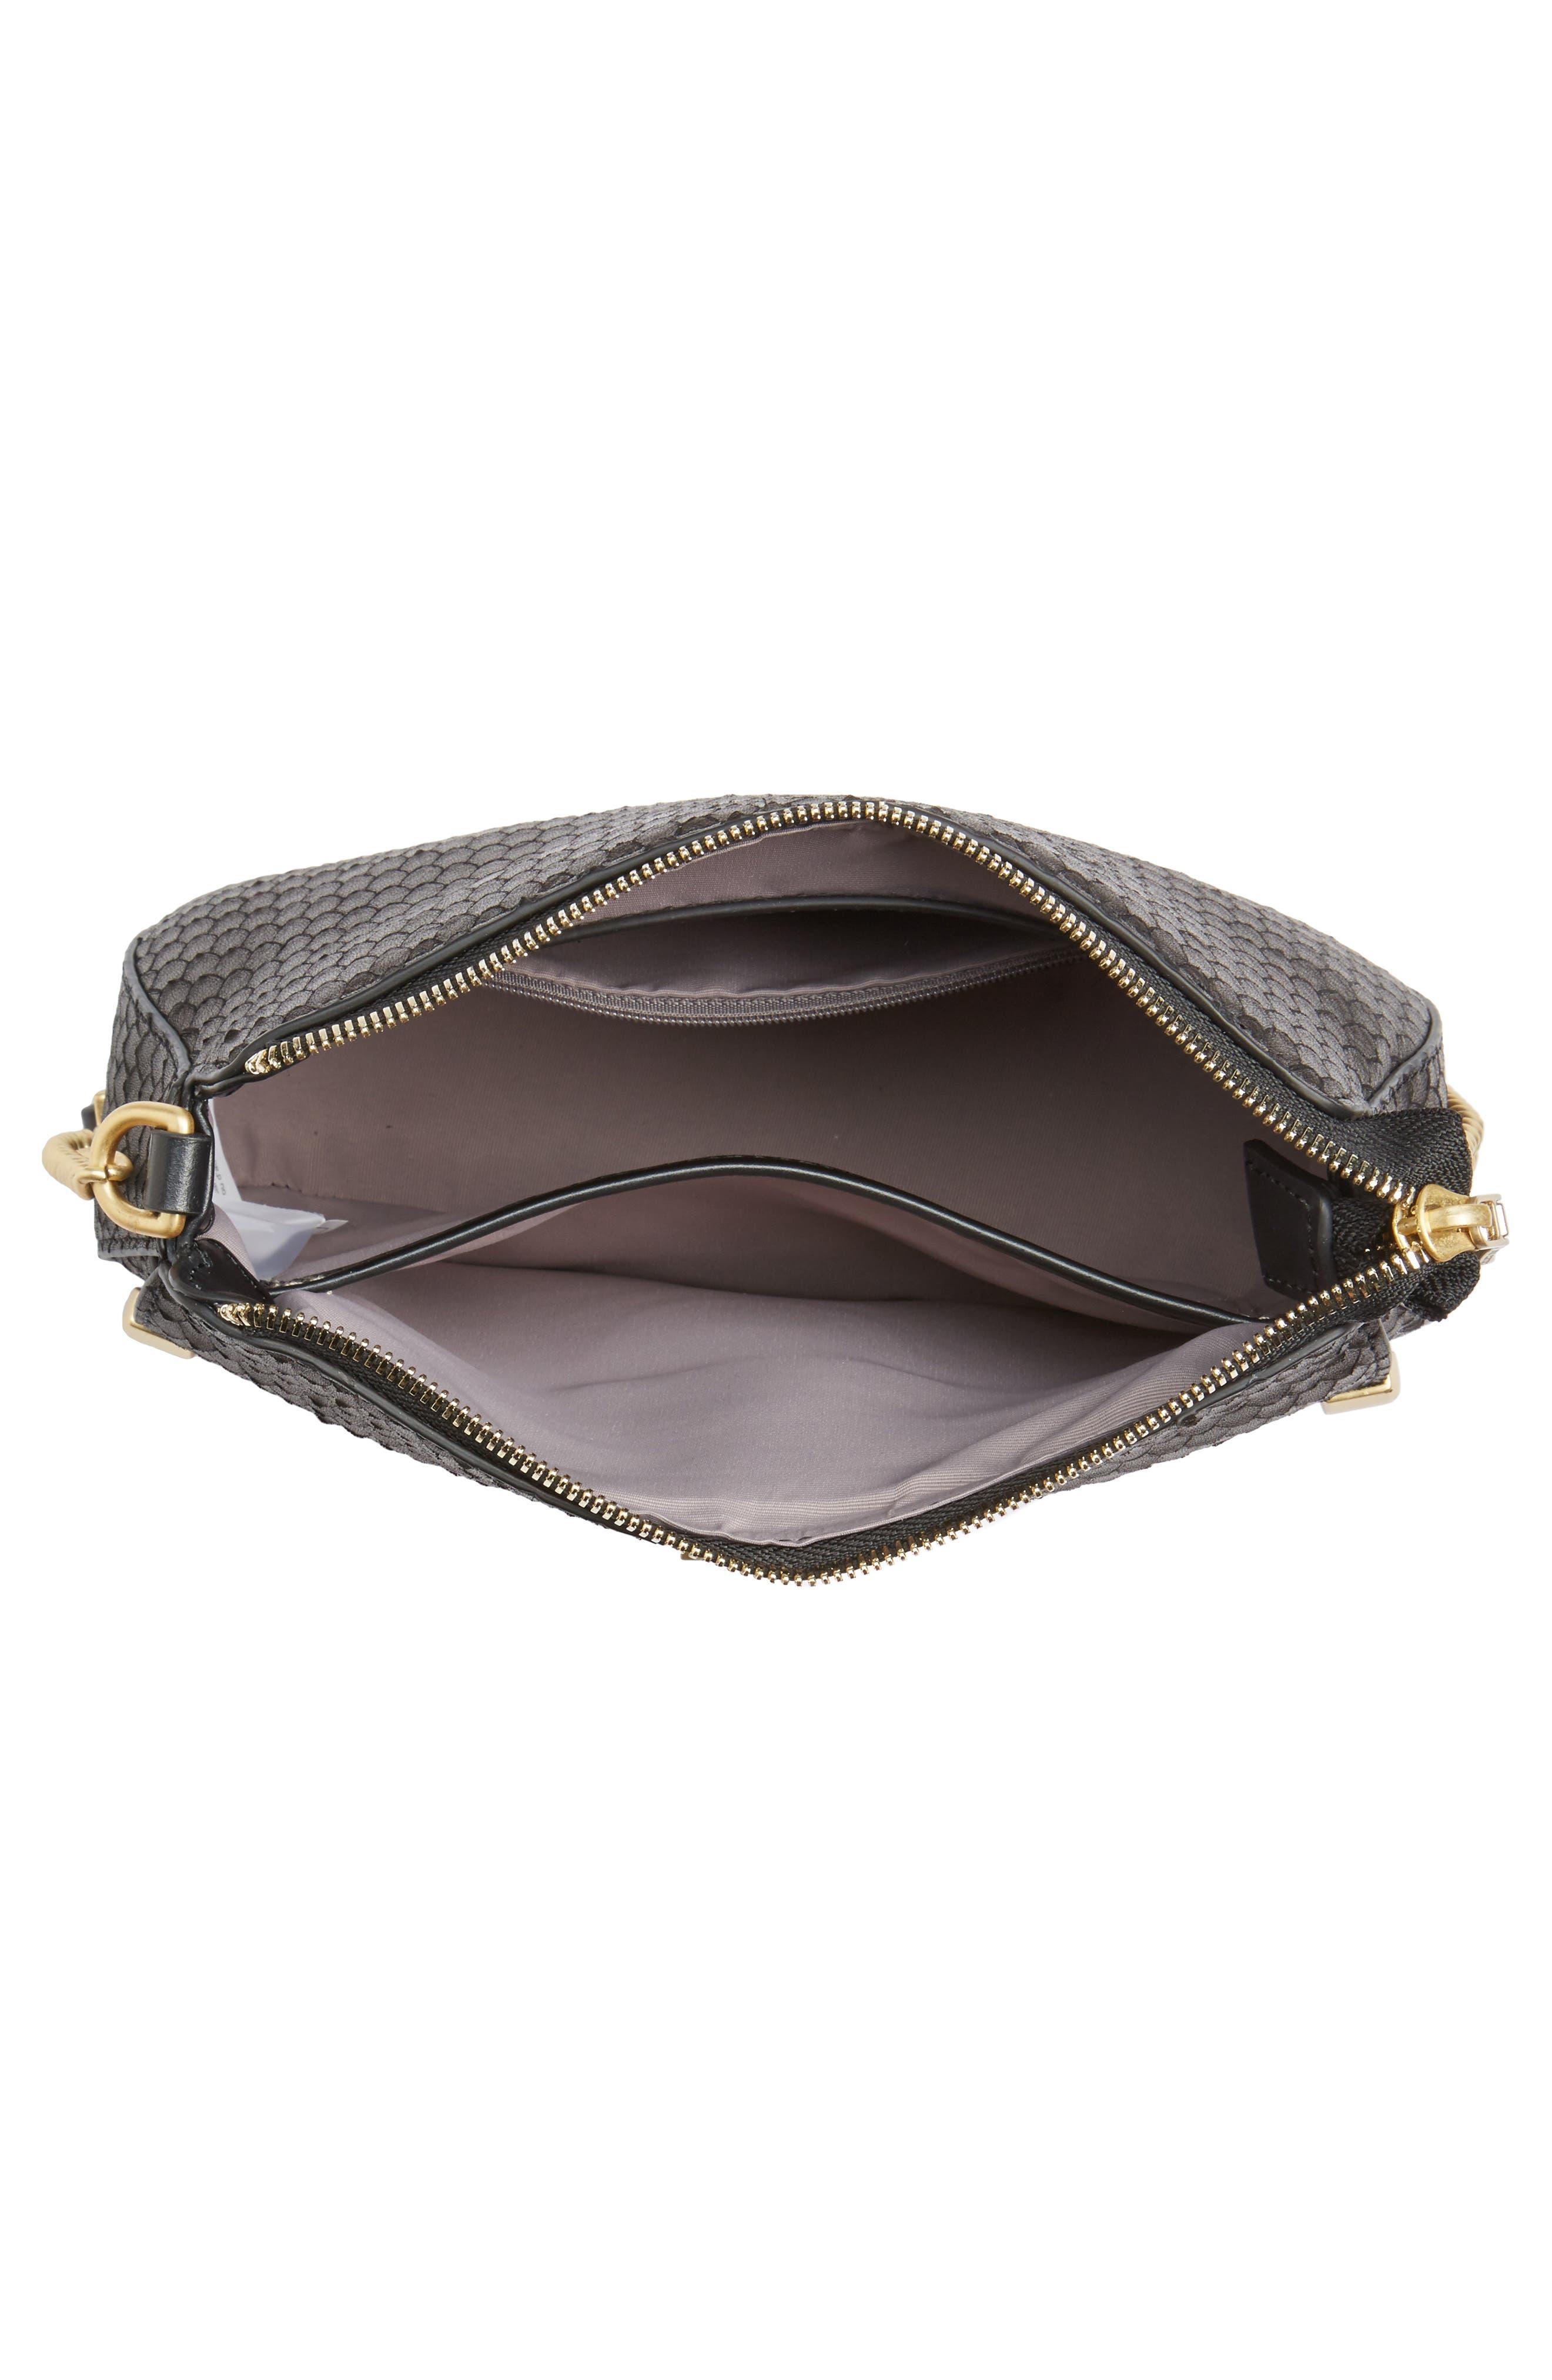 Céline Dion Octave Leather Crossbody Bag,                             Alternate thumbnail 4, color,